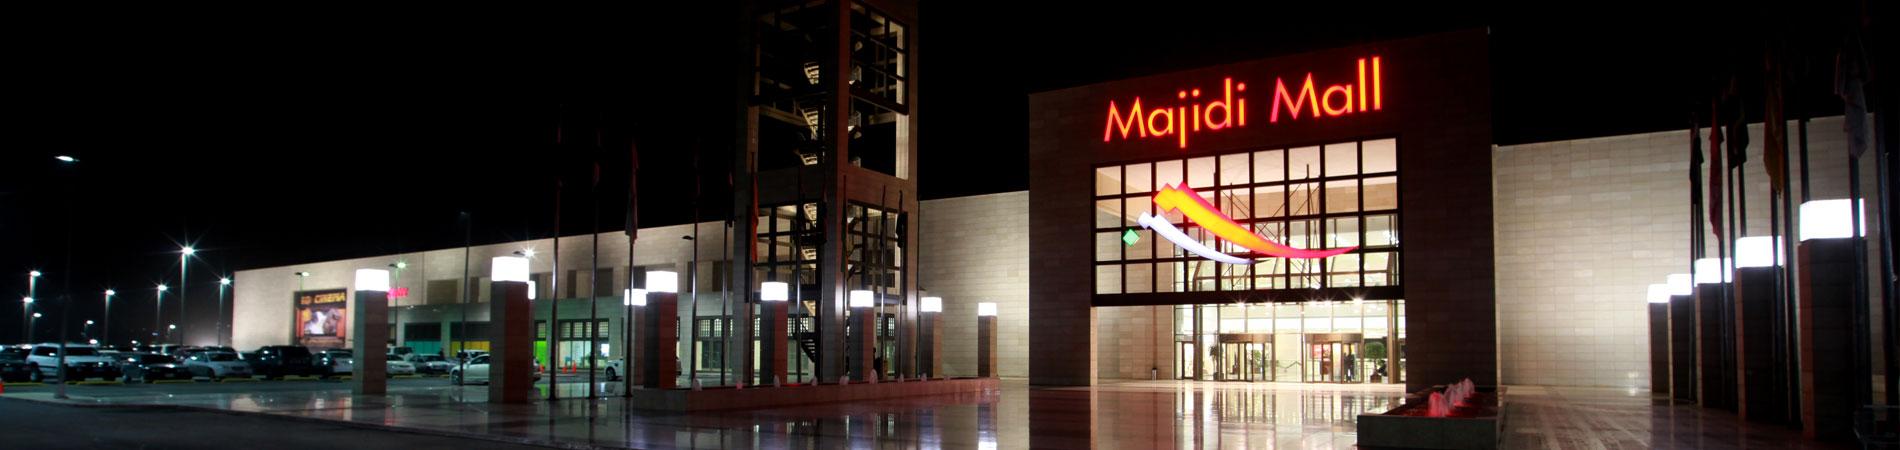 Majidi Mall (Shops)